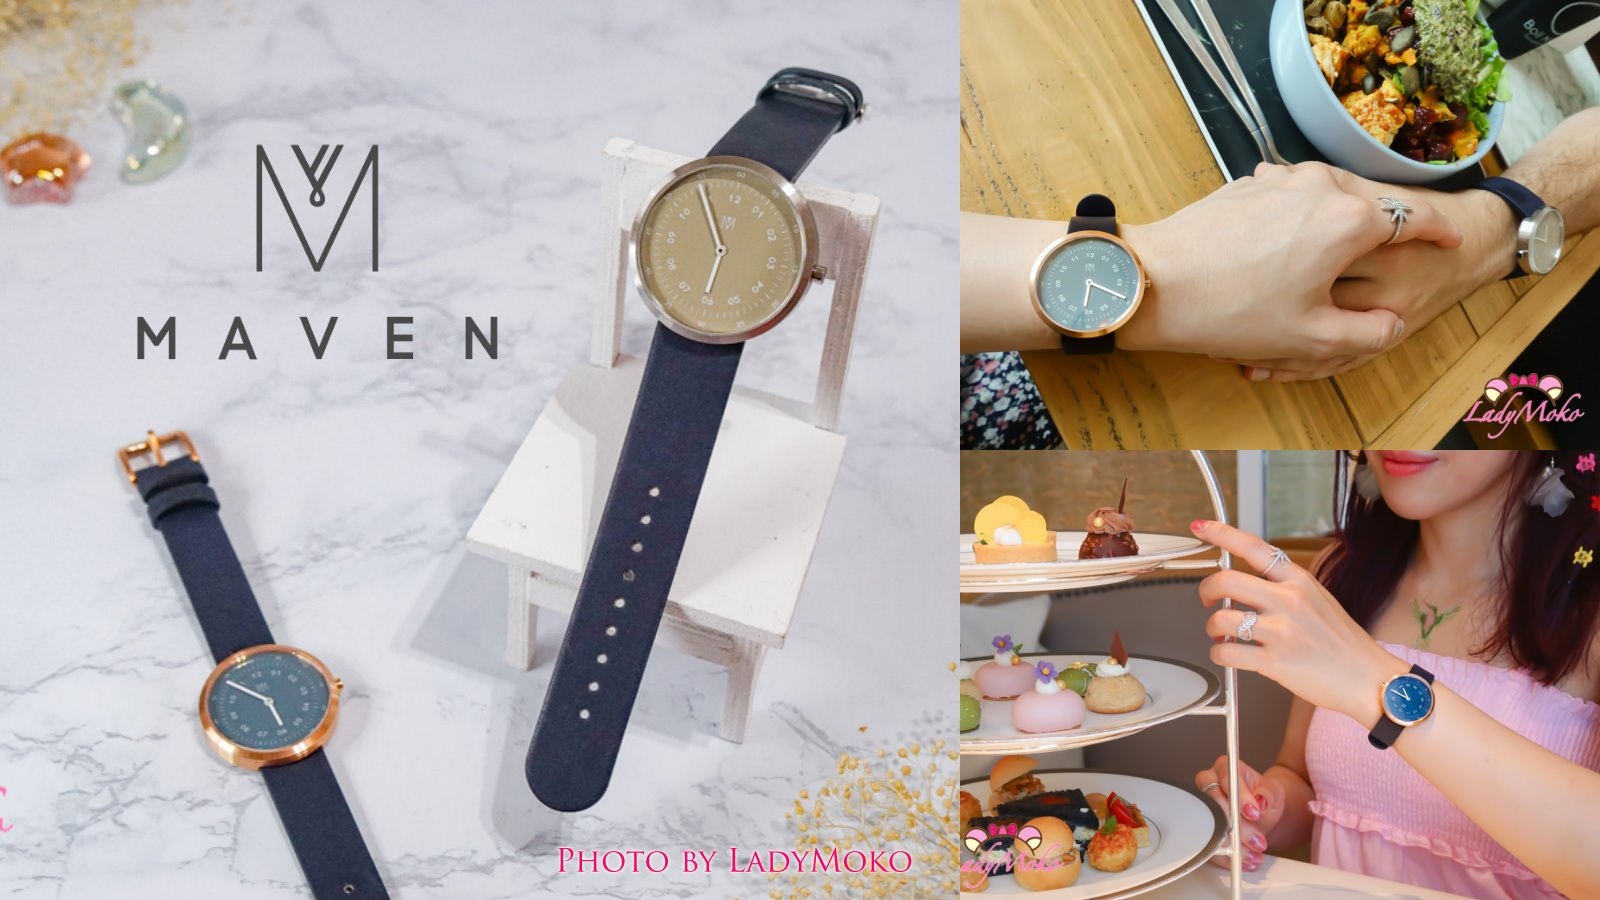 Maven Watches香港設計品牌開箱 時尚簡約客製化刻字手錶/情侶對錶